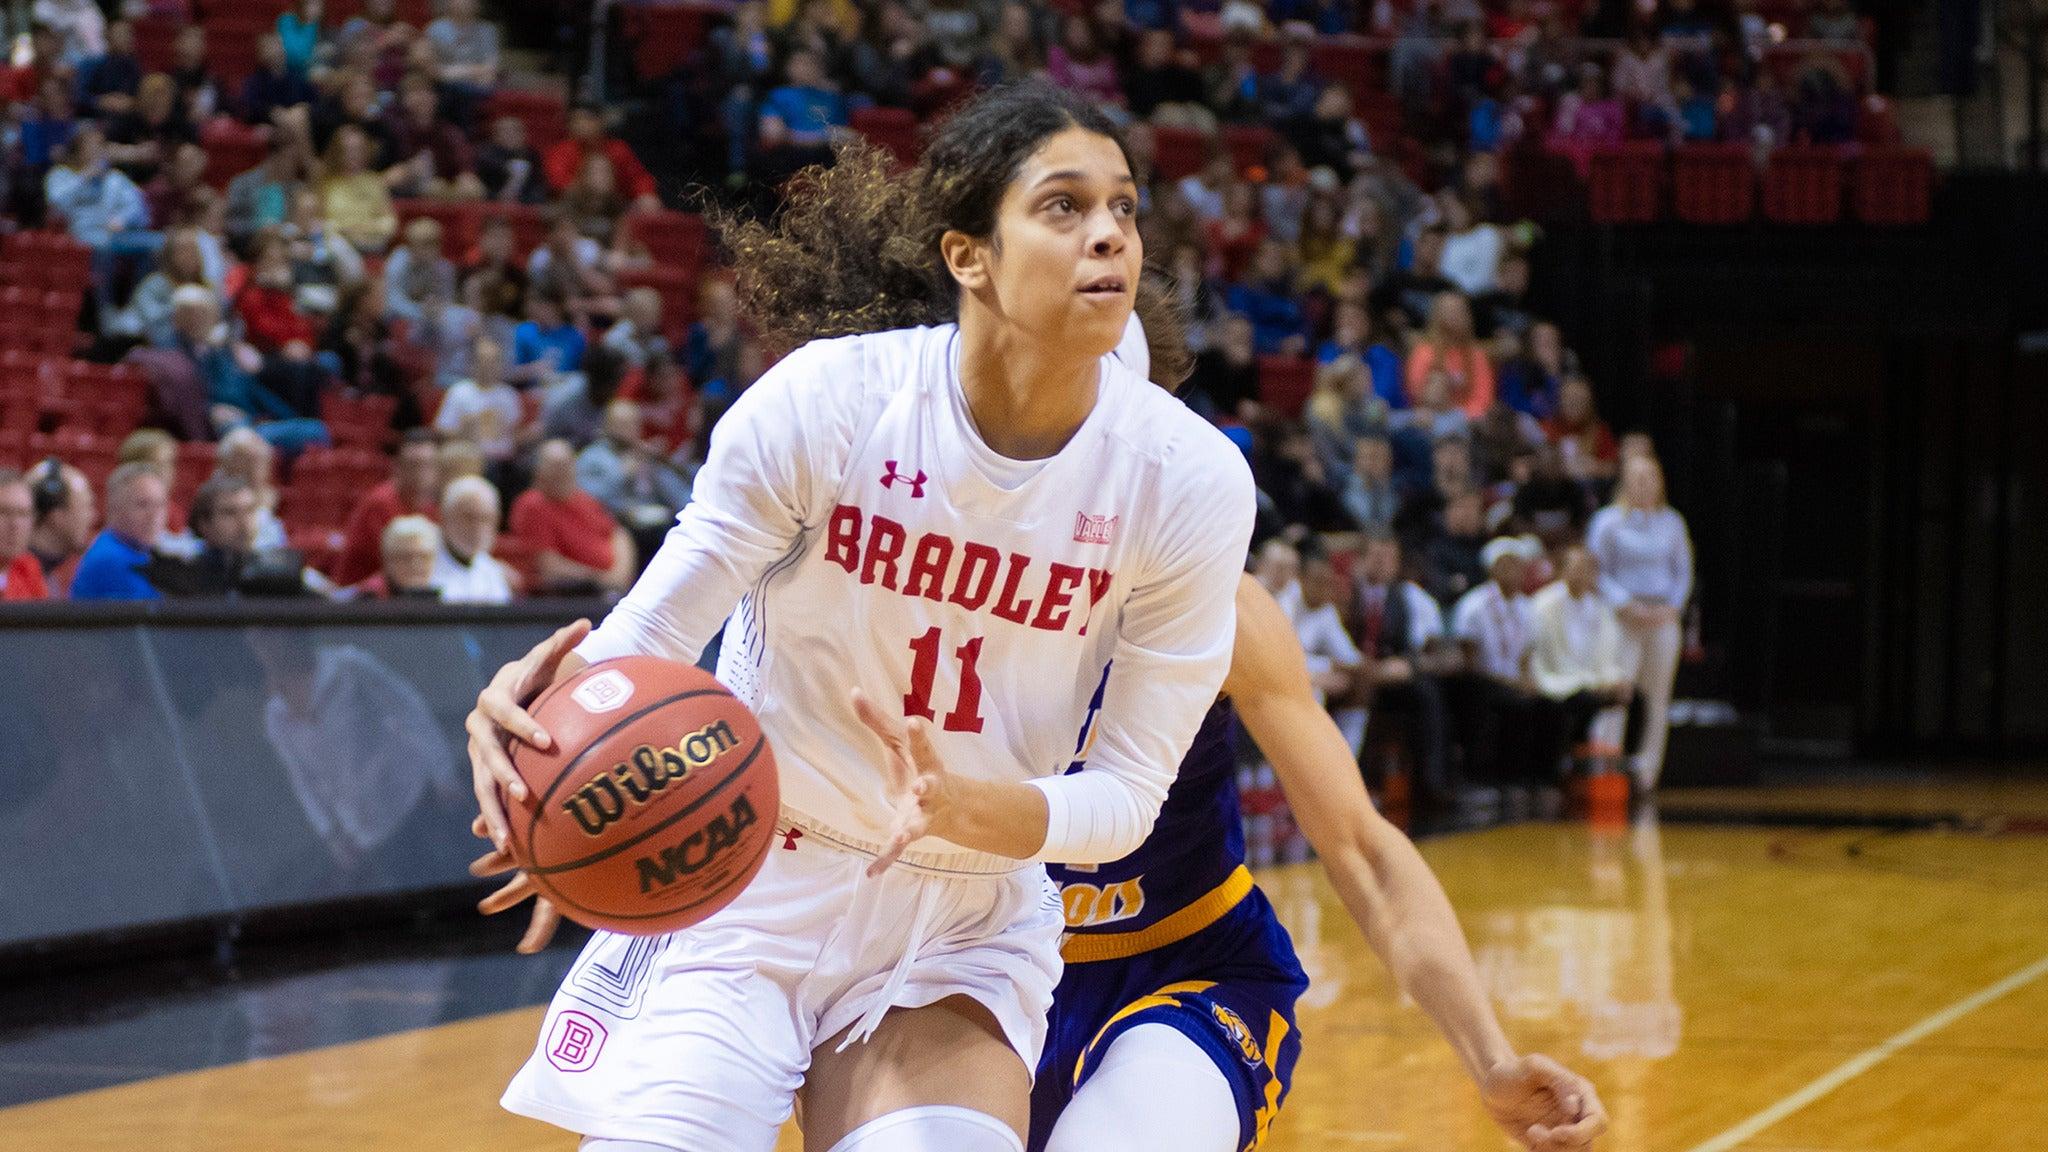 Bradley Braves Womens Basketball